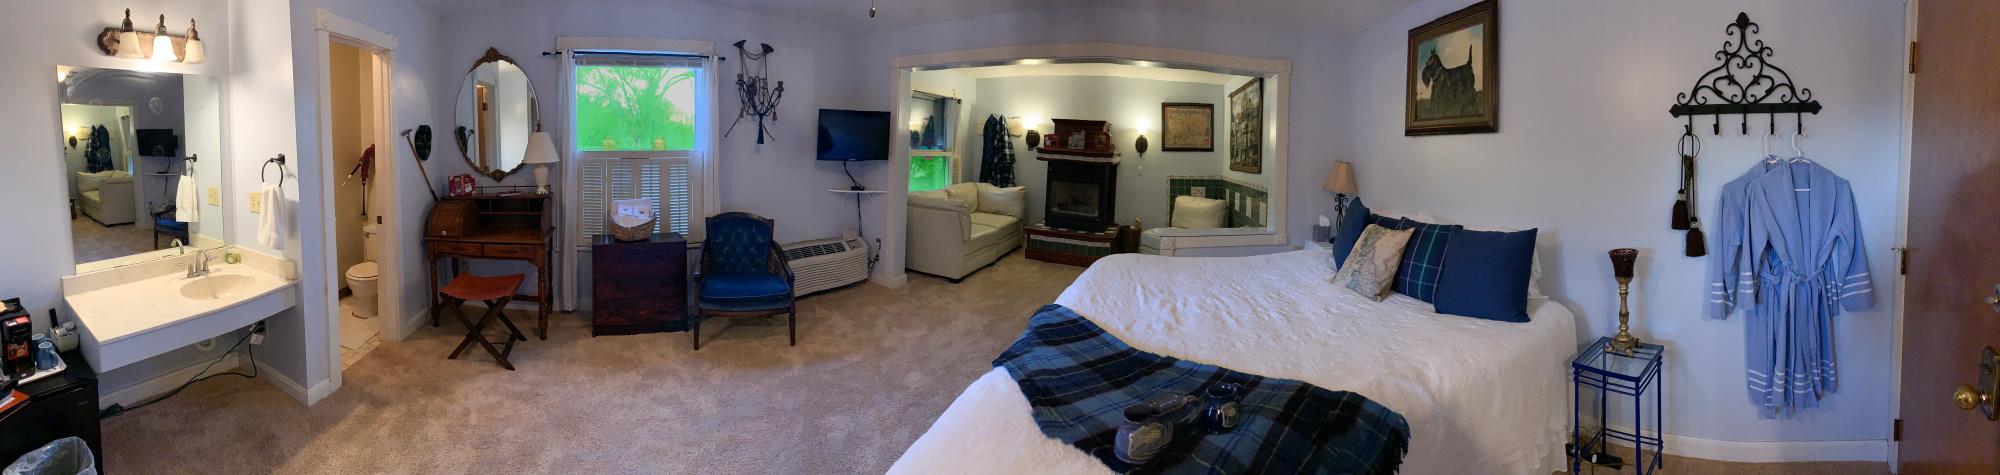 WI-Scottish-room2019wide